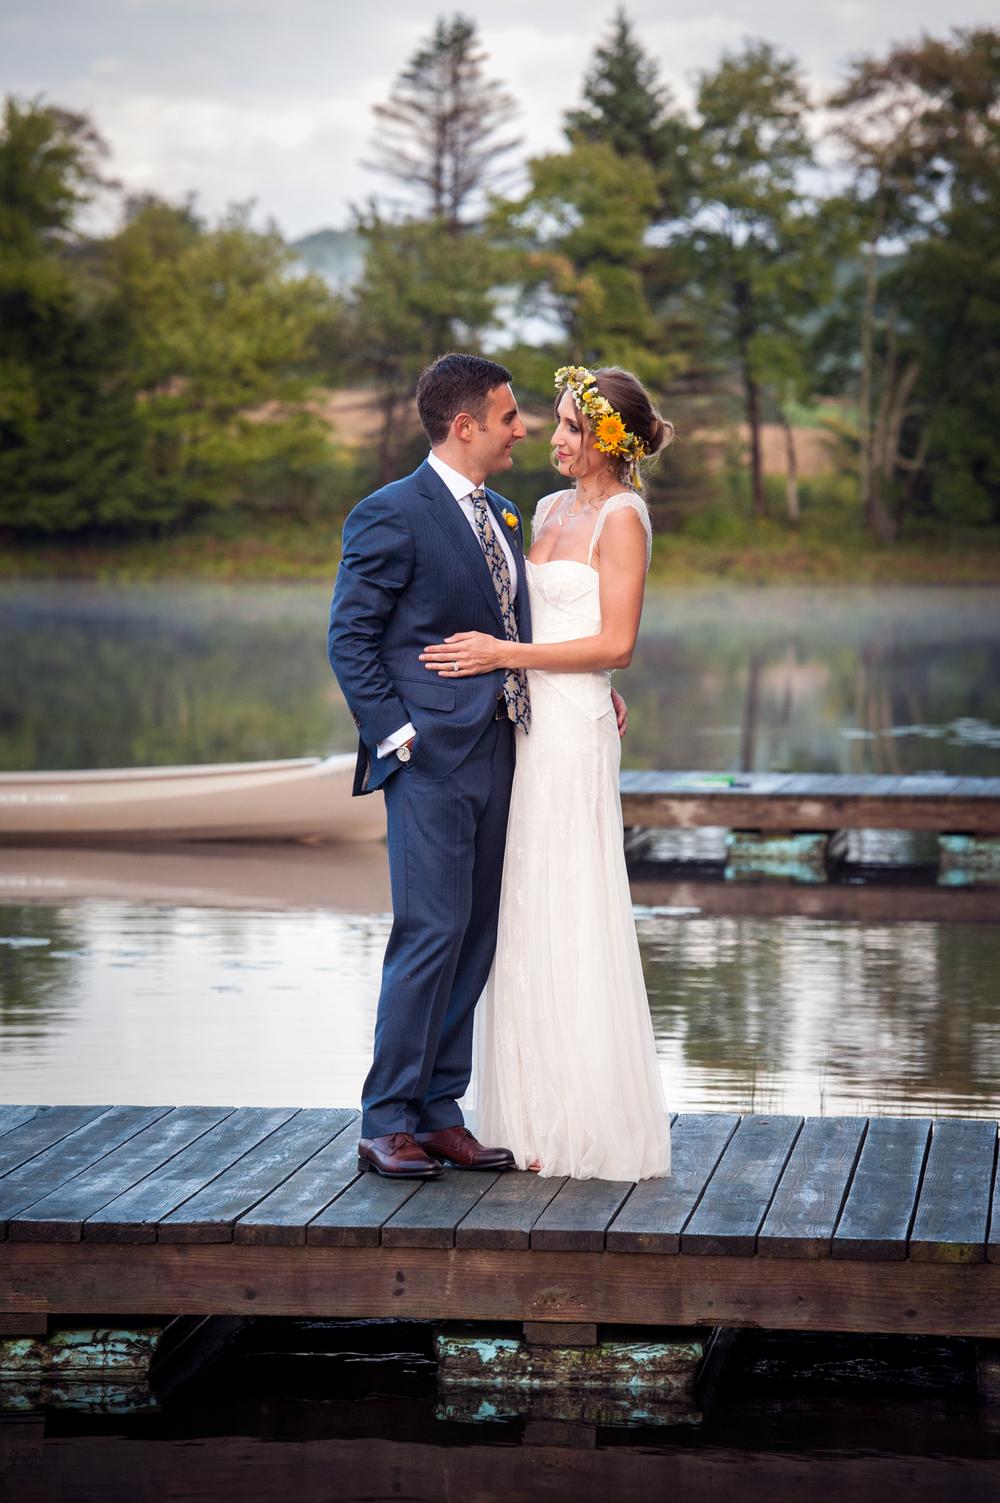 Rochester Wedding Photography 001.jpg